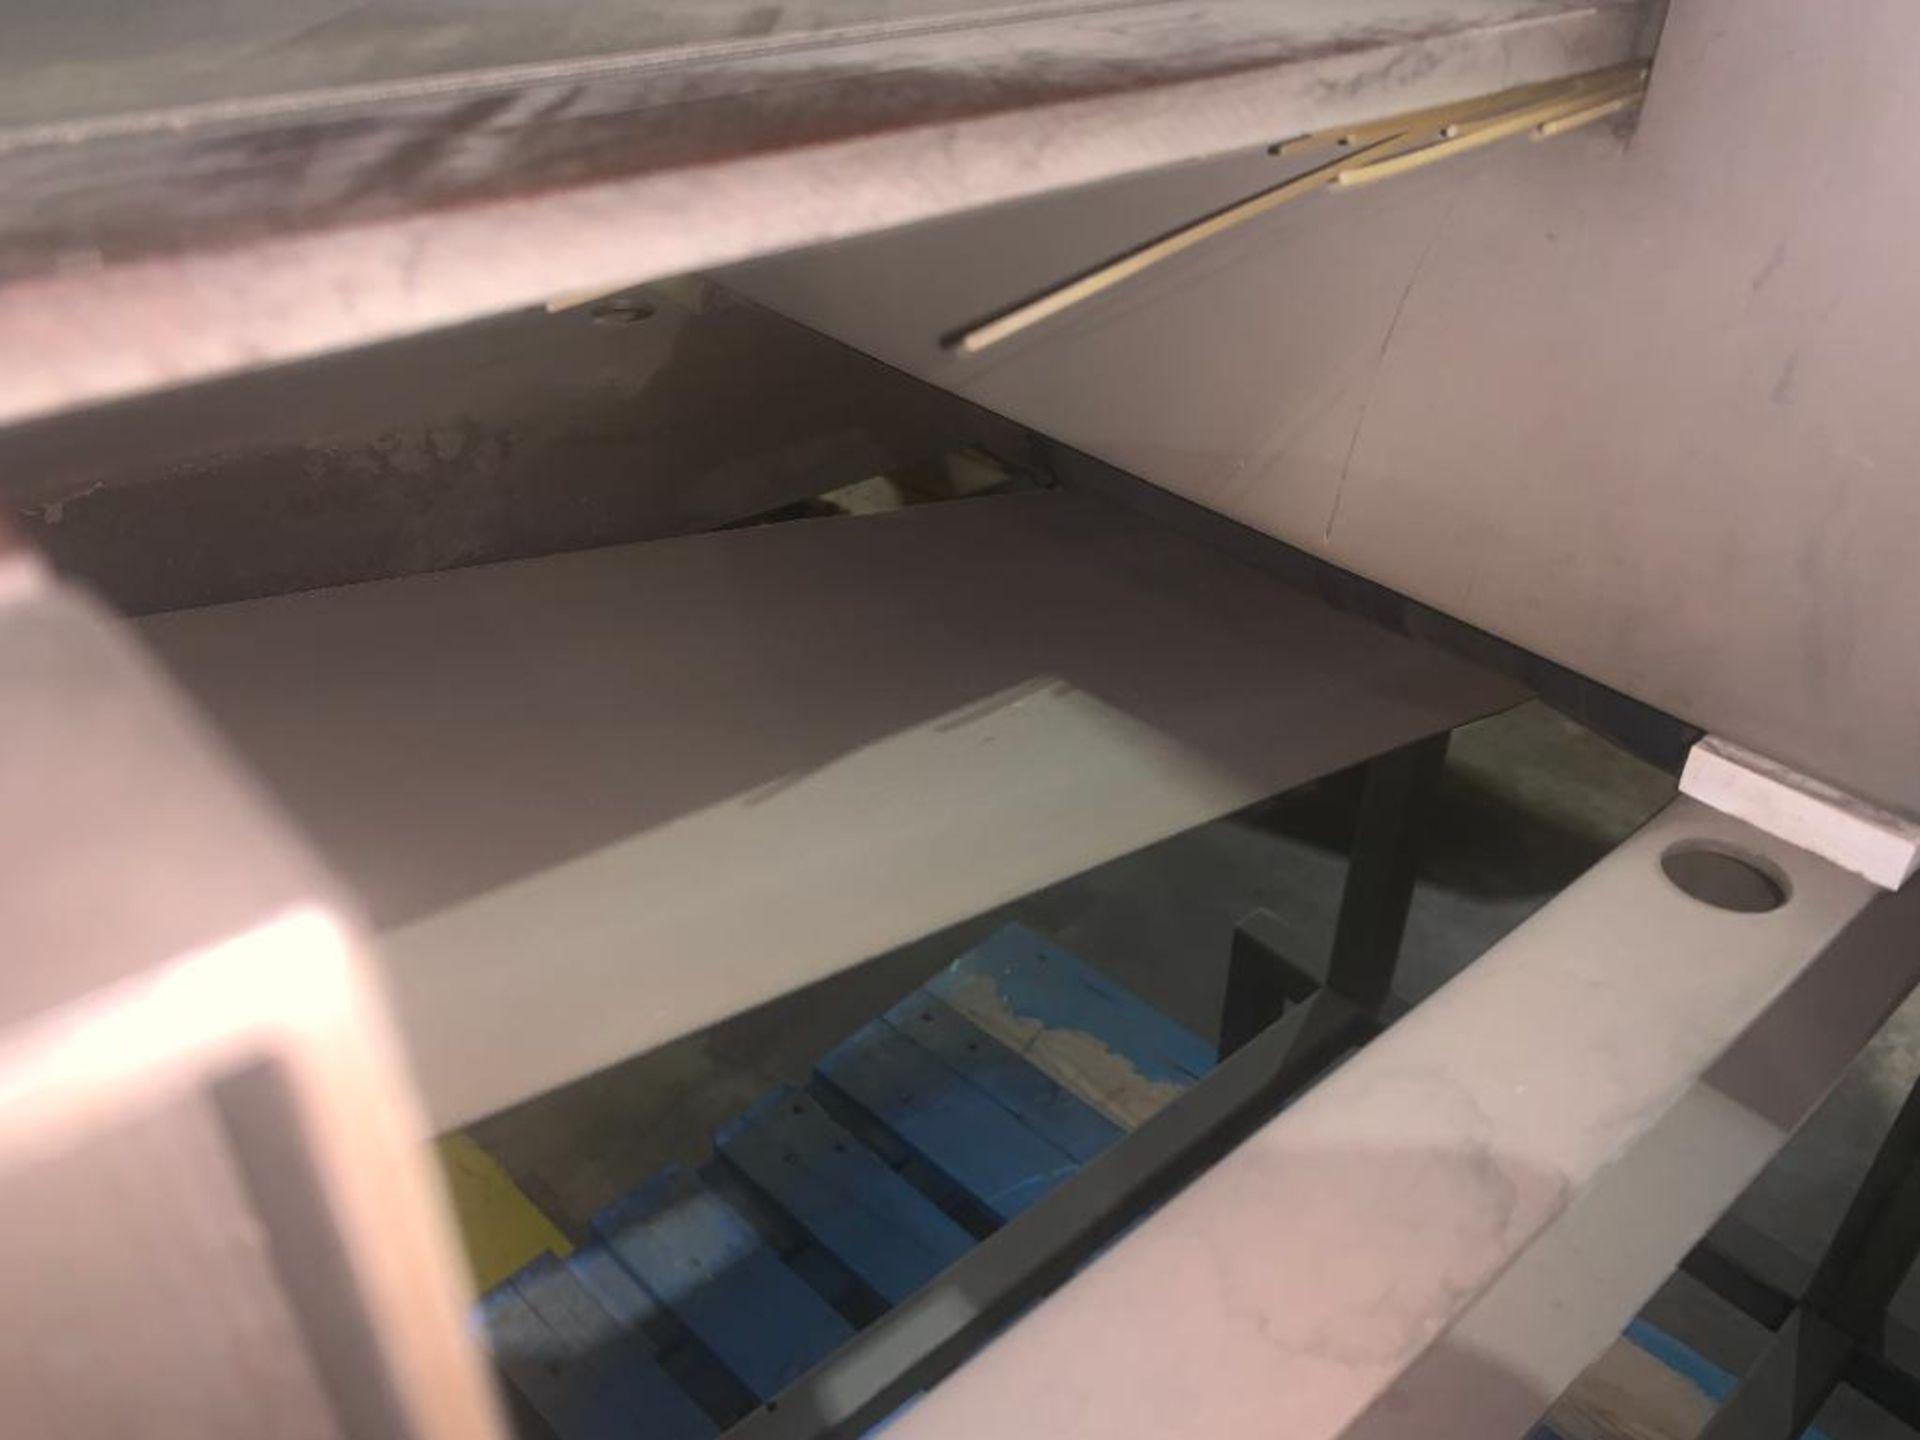 Loma metal detector - Image 10 of 10